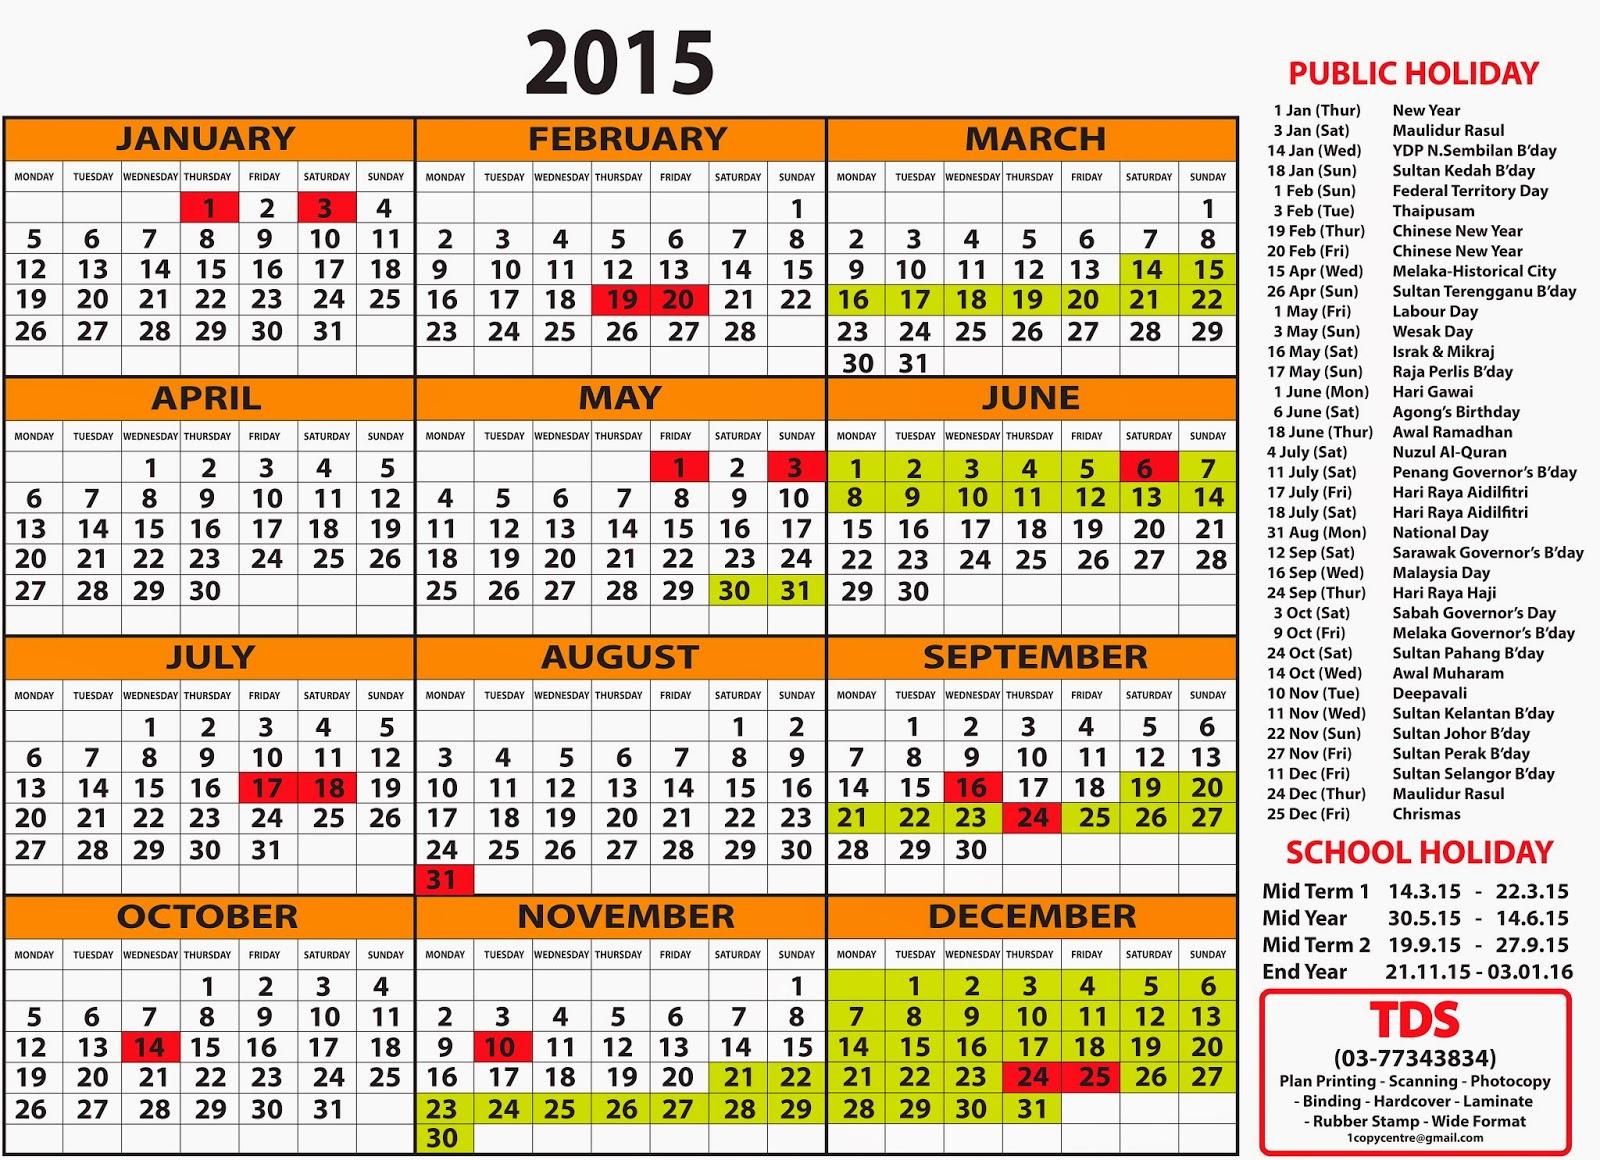 Tds With Regard To 2015 Doe School Calendar